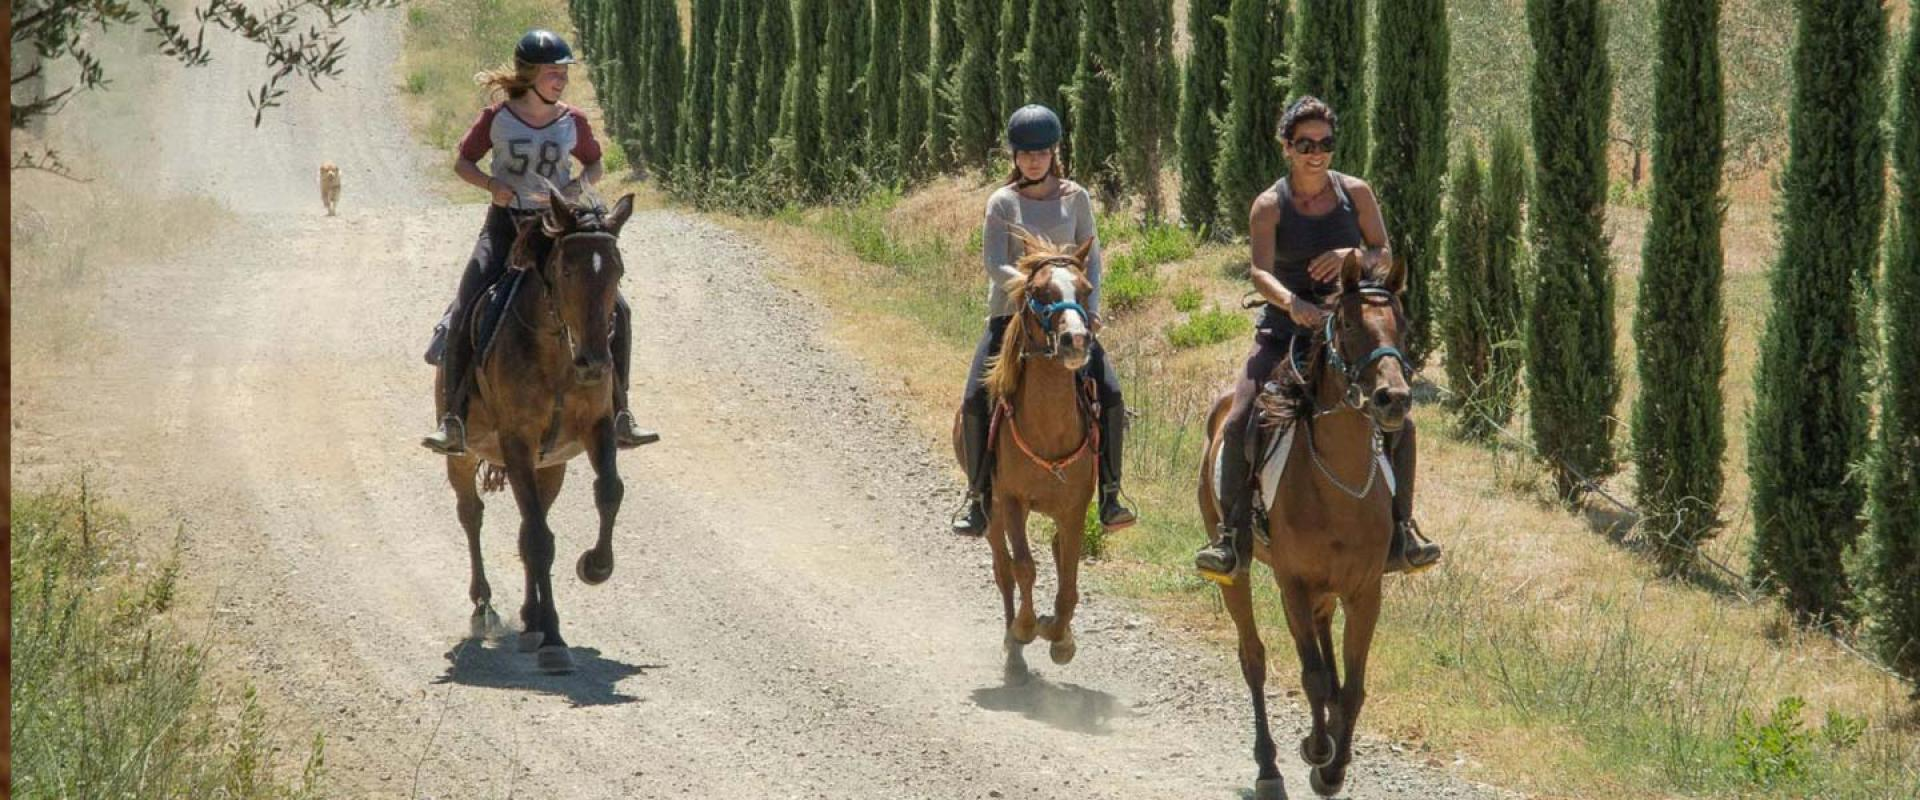 horse riding in Maremma